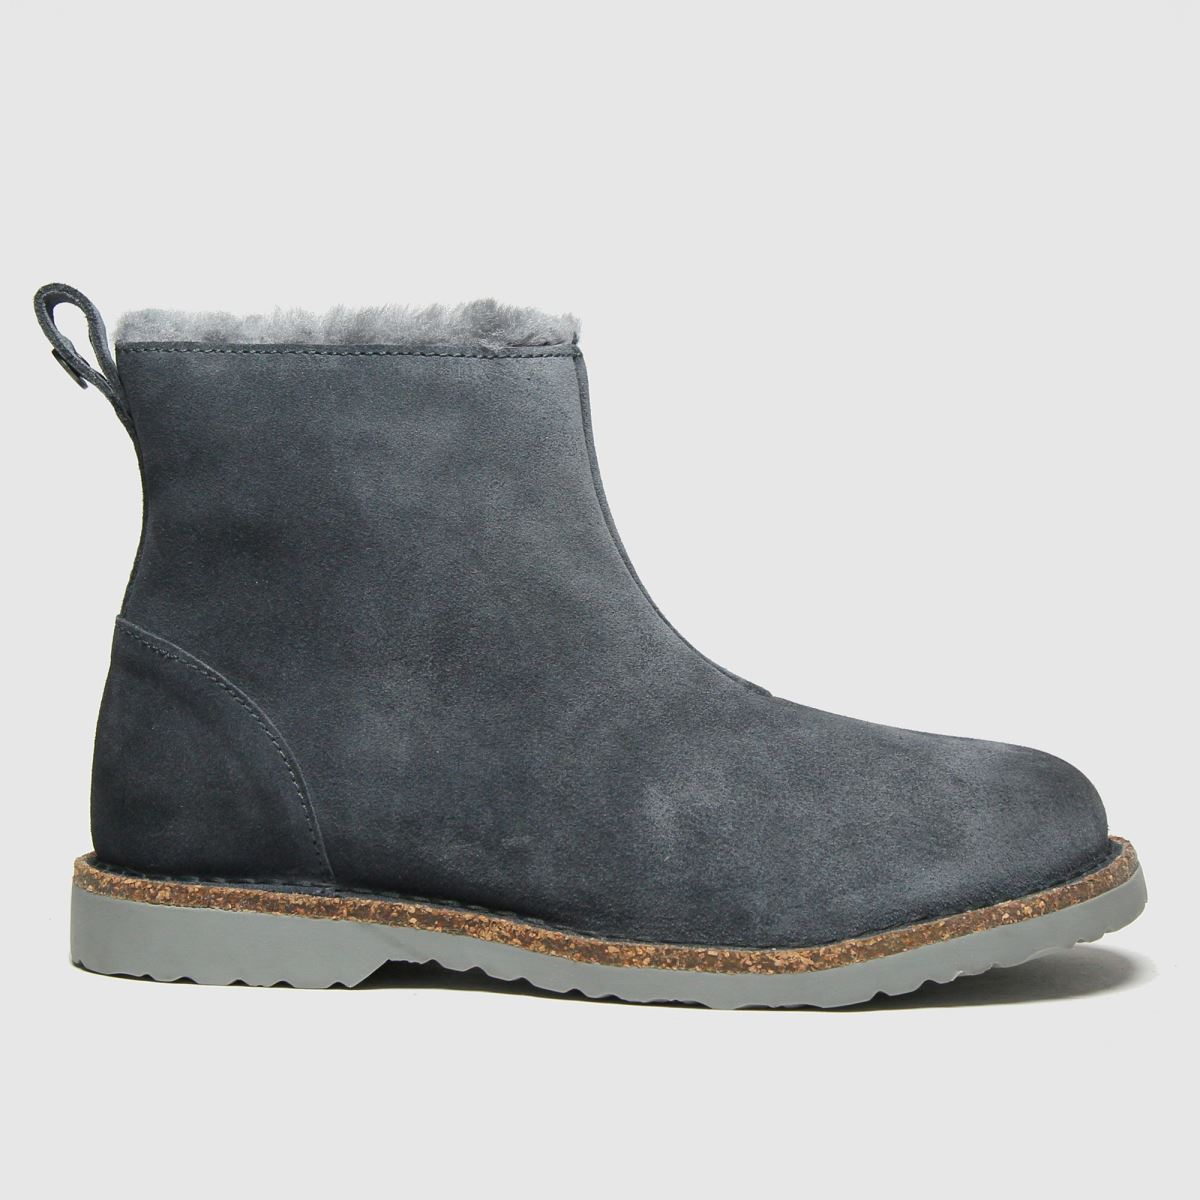 BIRKENSTOCK Grey Melrose Boots